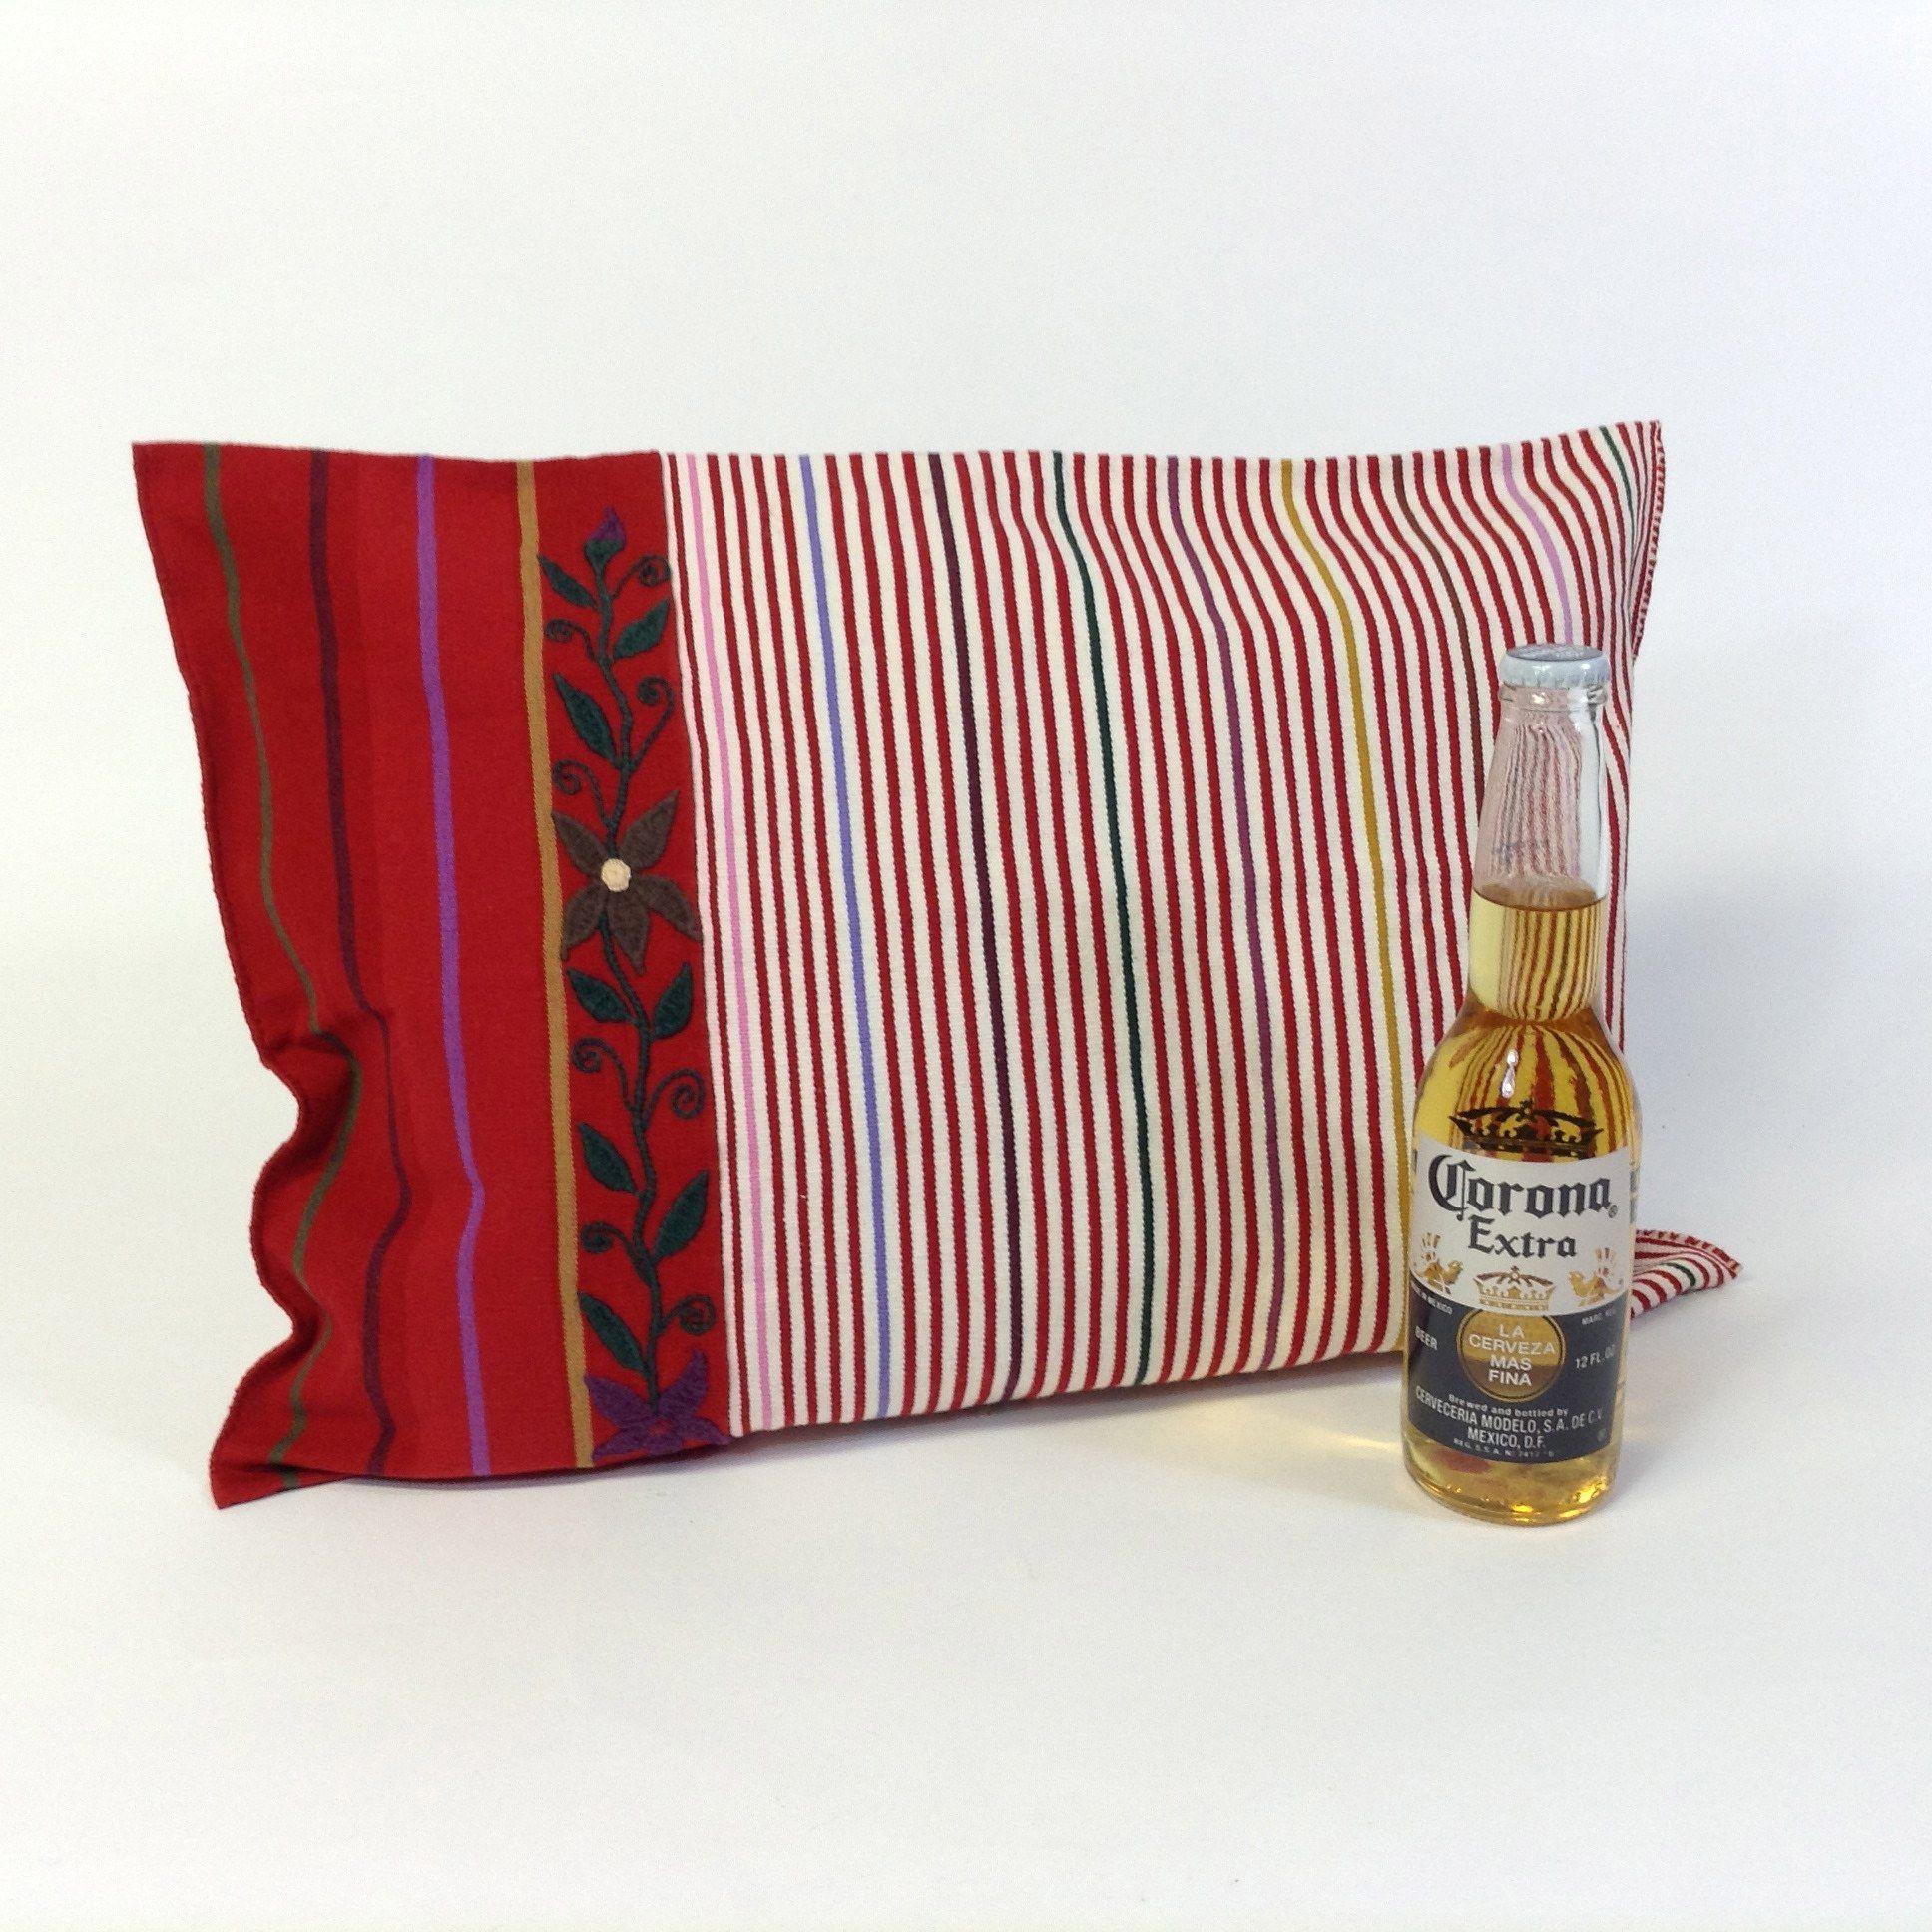 A beautifully handmade pillowcase from